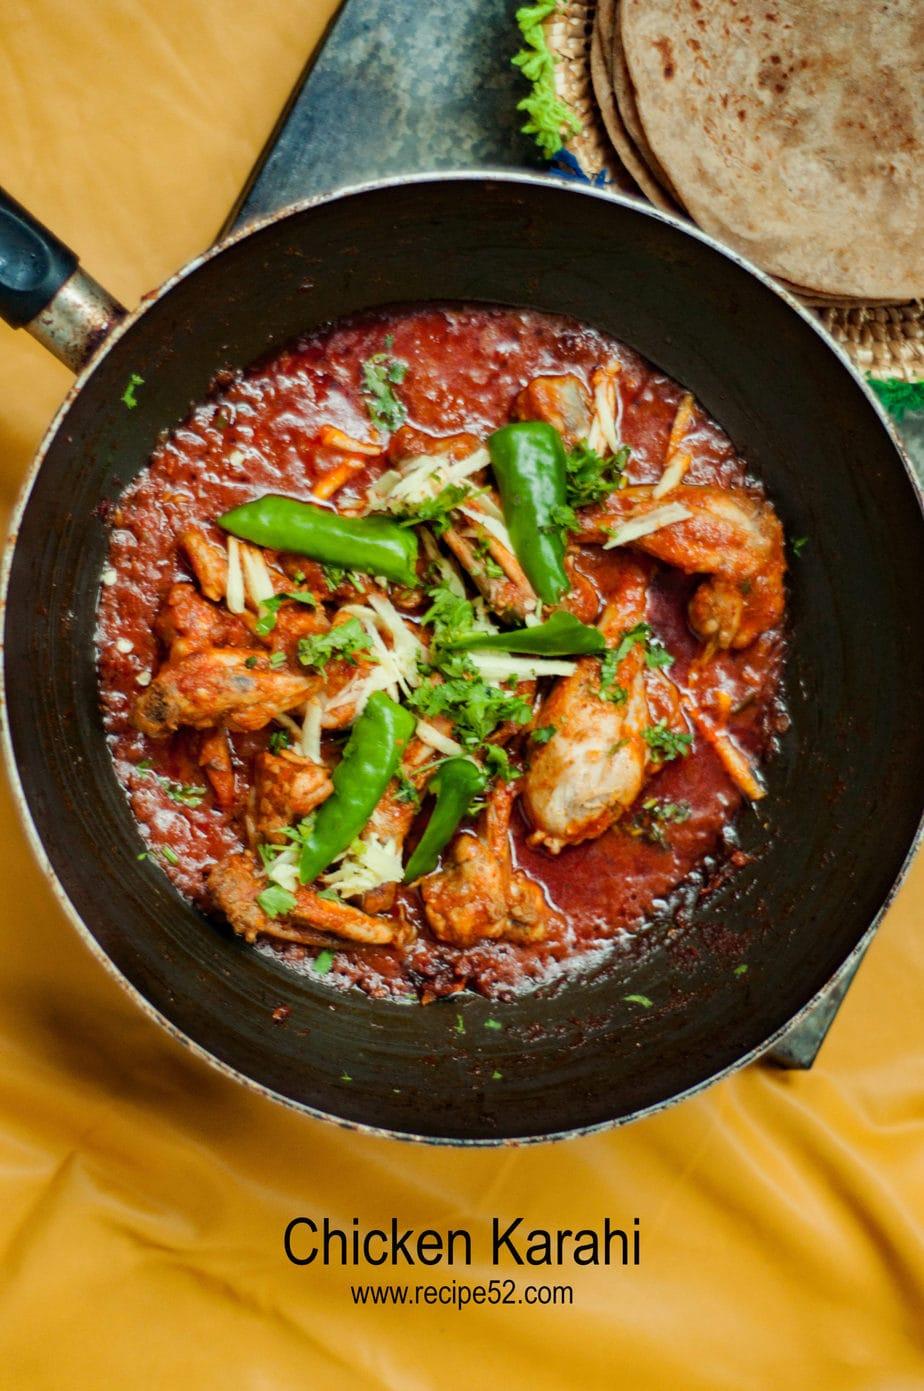 Pakistani Chicken Karahi Recipe | Step by step with photos